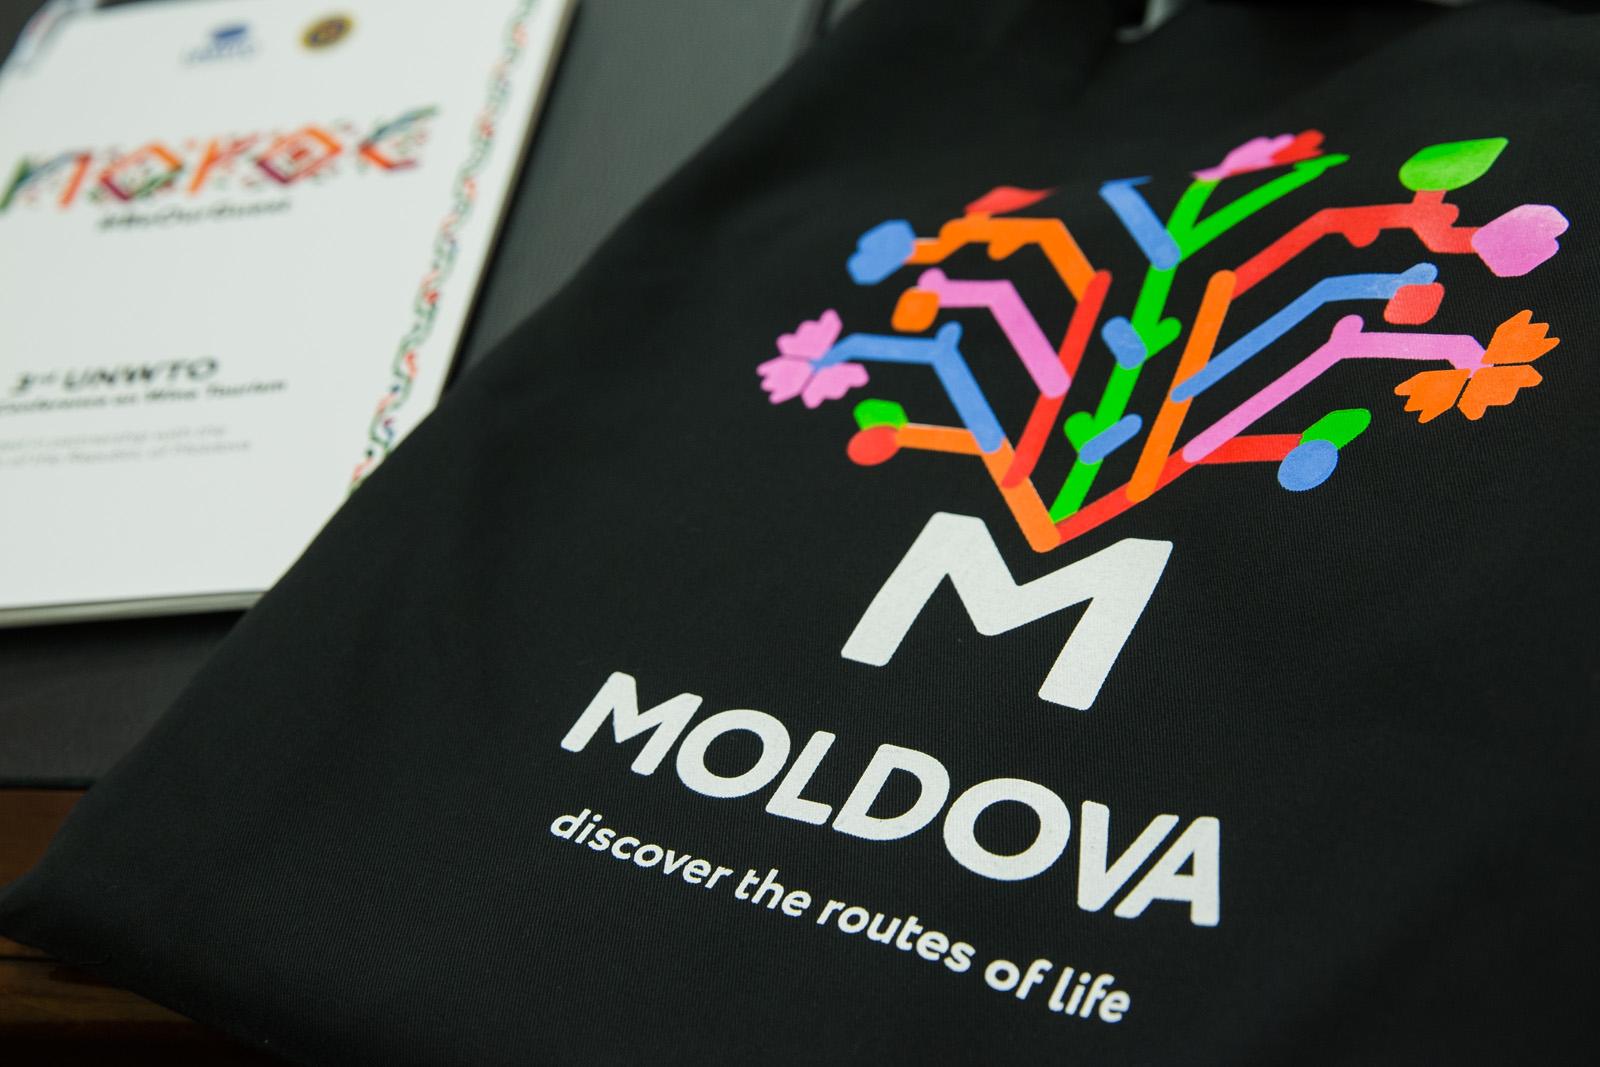 pomul vietii, republica moldova, be our guest, pdm chisinau